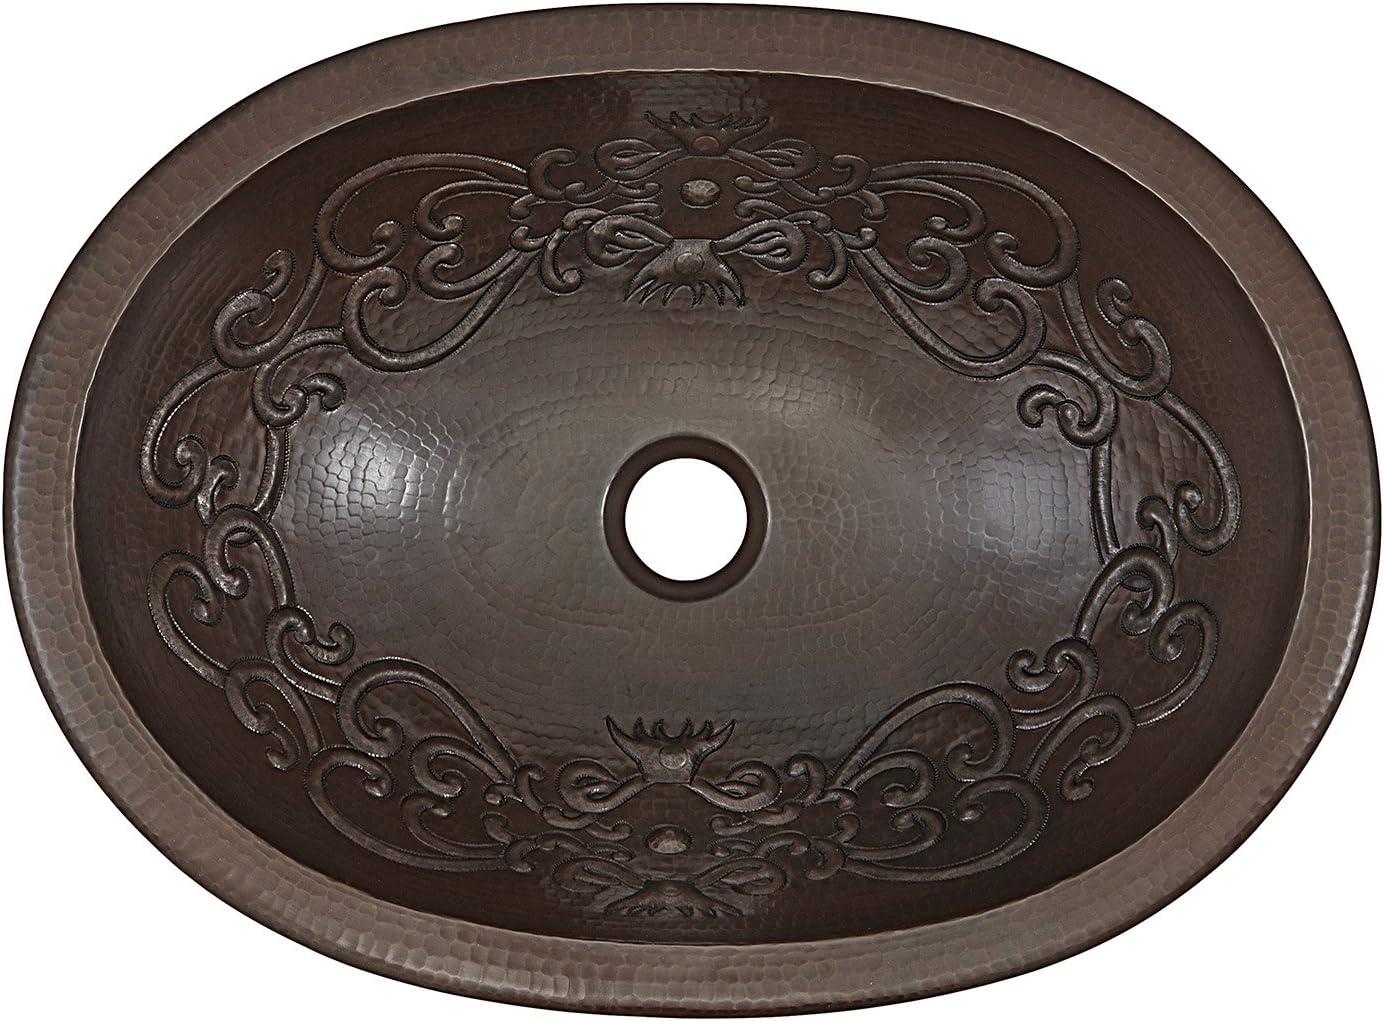 Aged Copper Sinkology SB202-19SC-F042-AMZ Pauling Undermount or Drop Bath Sink Pfister Ashfield Faucet and Drain Bathroom All-in-One Kit